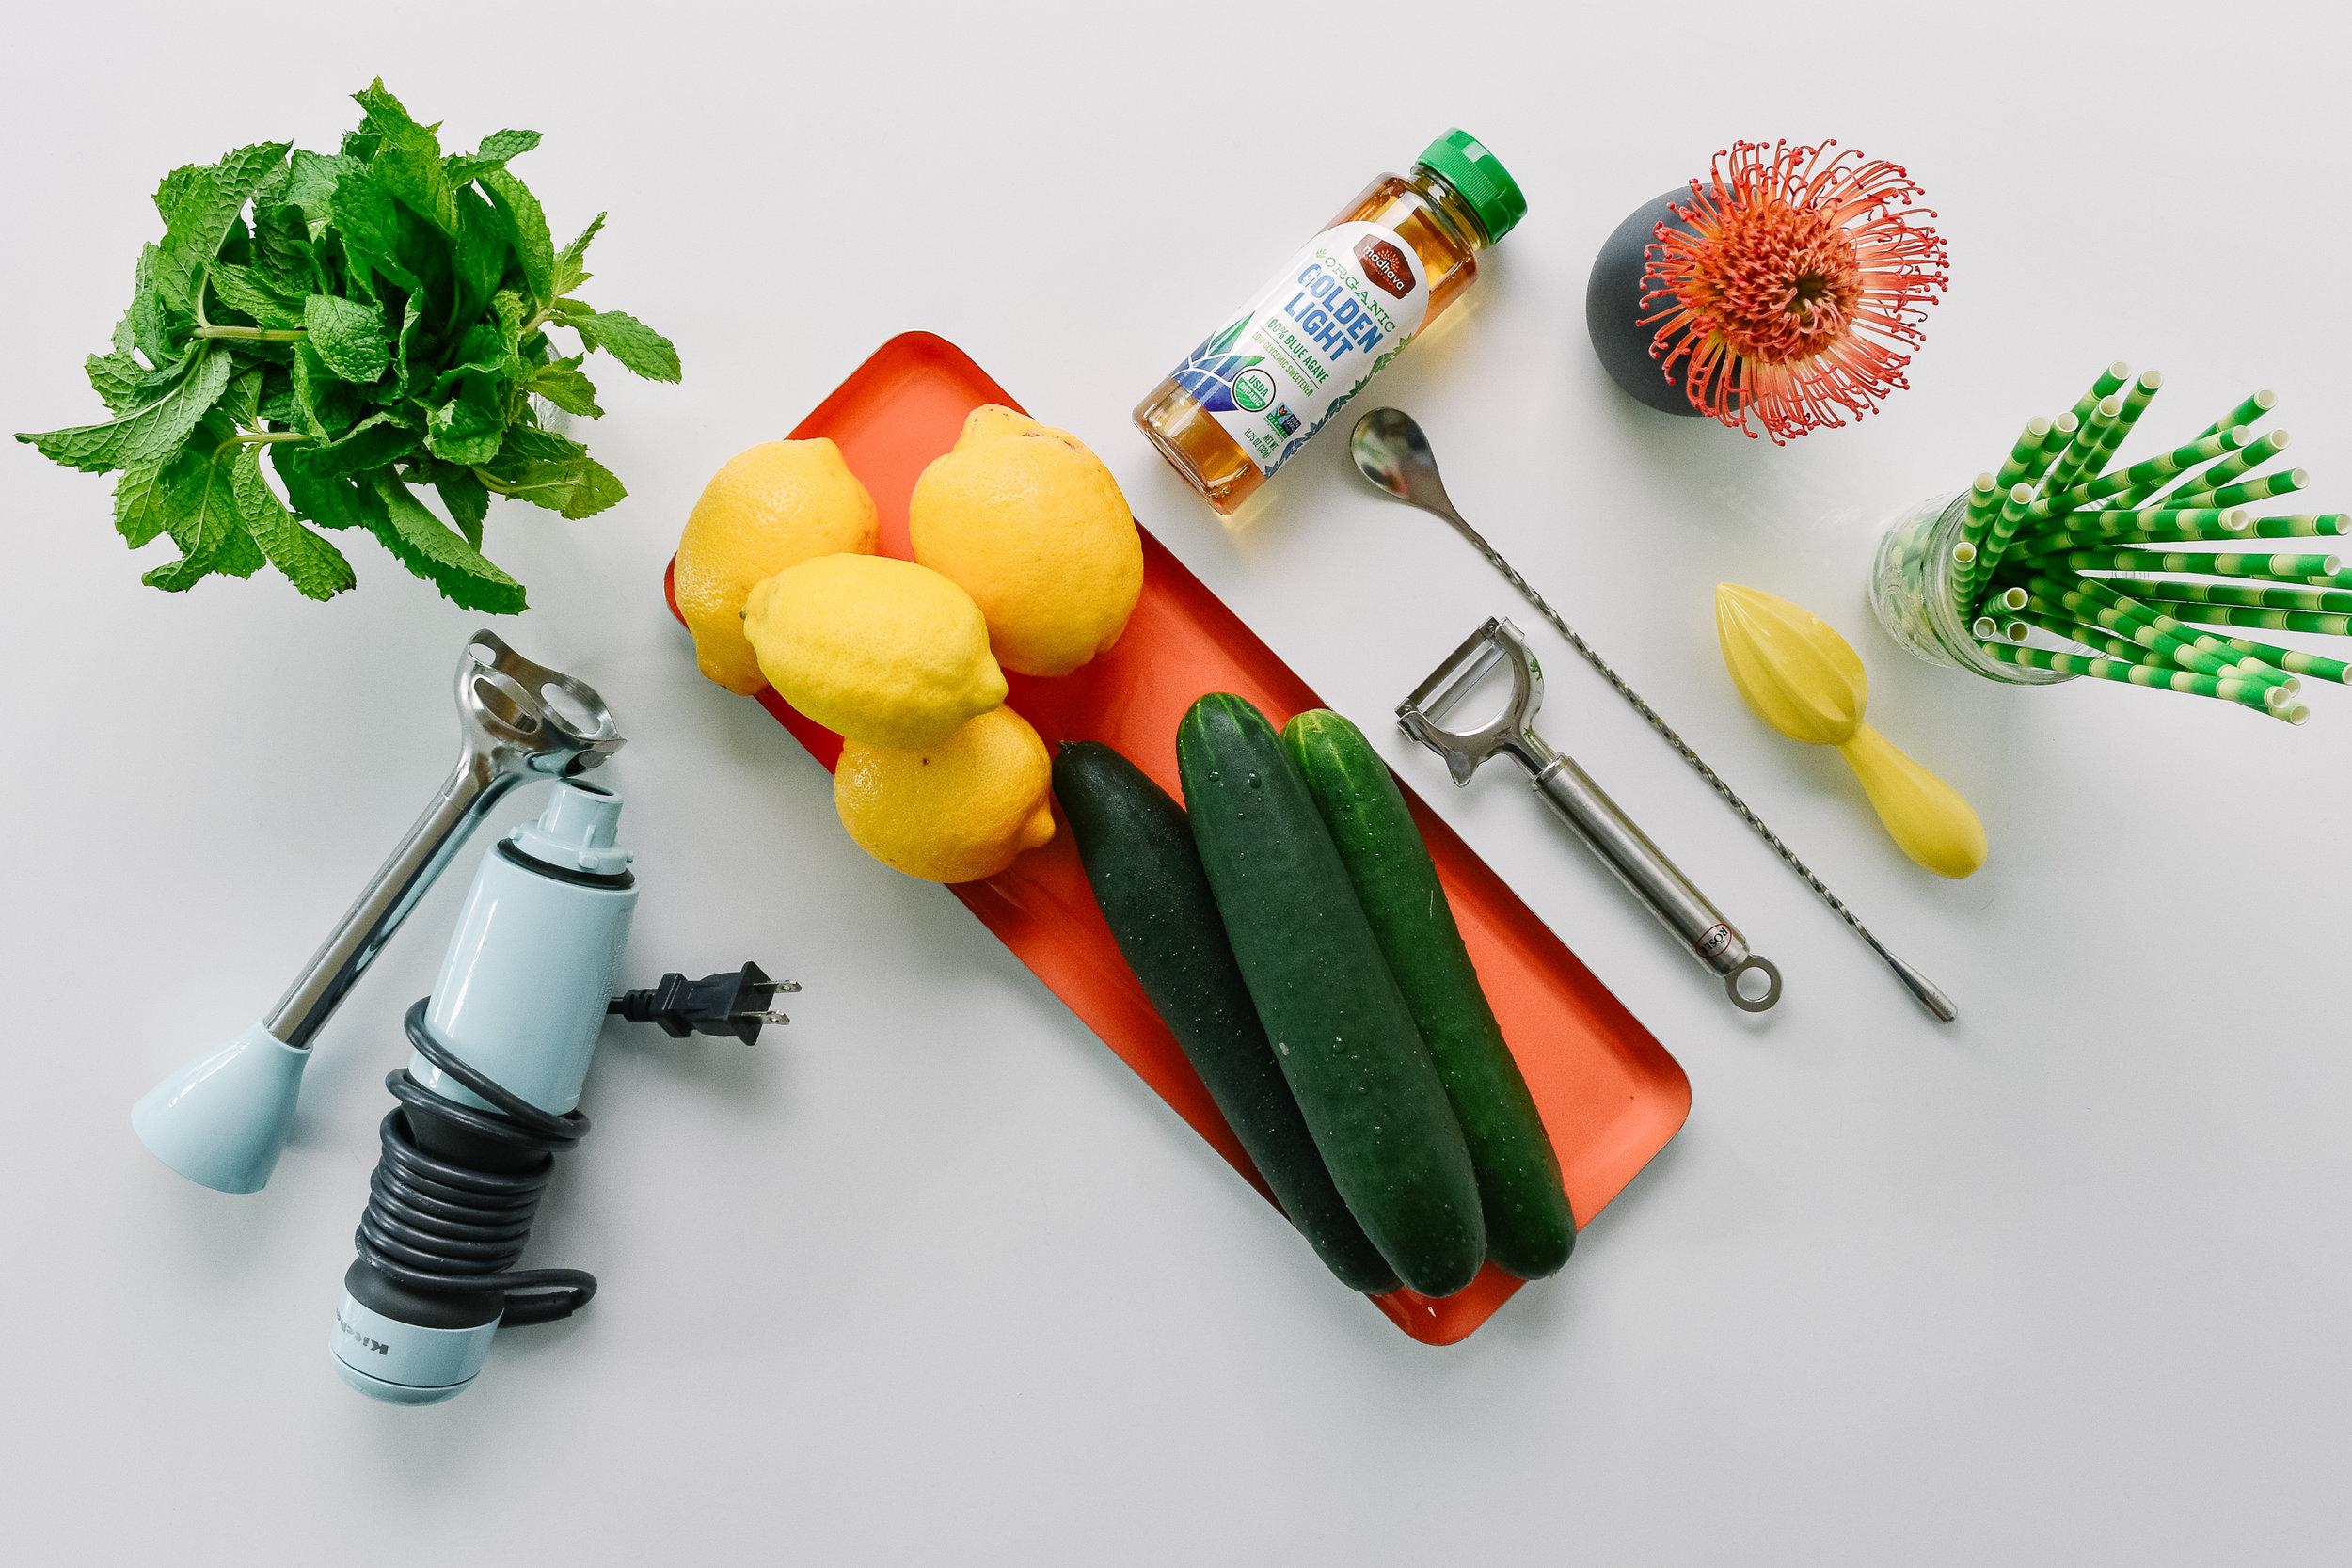 Zero-proof cucumber mint spritzer mocktail ingredients